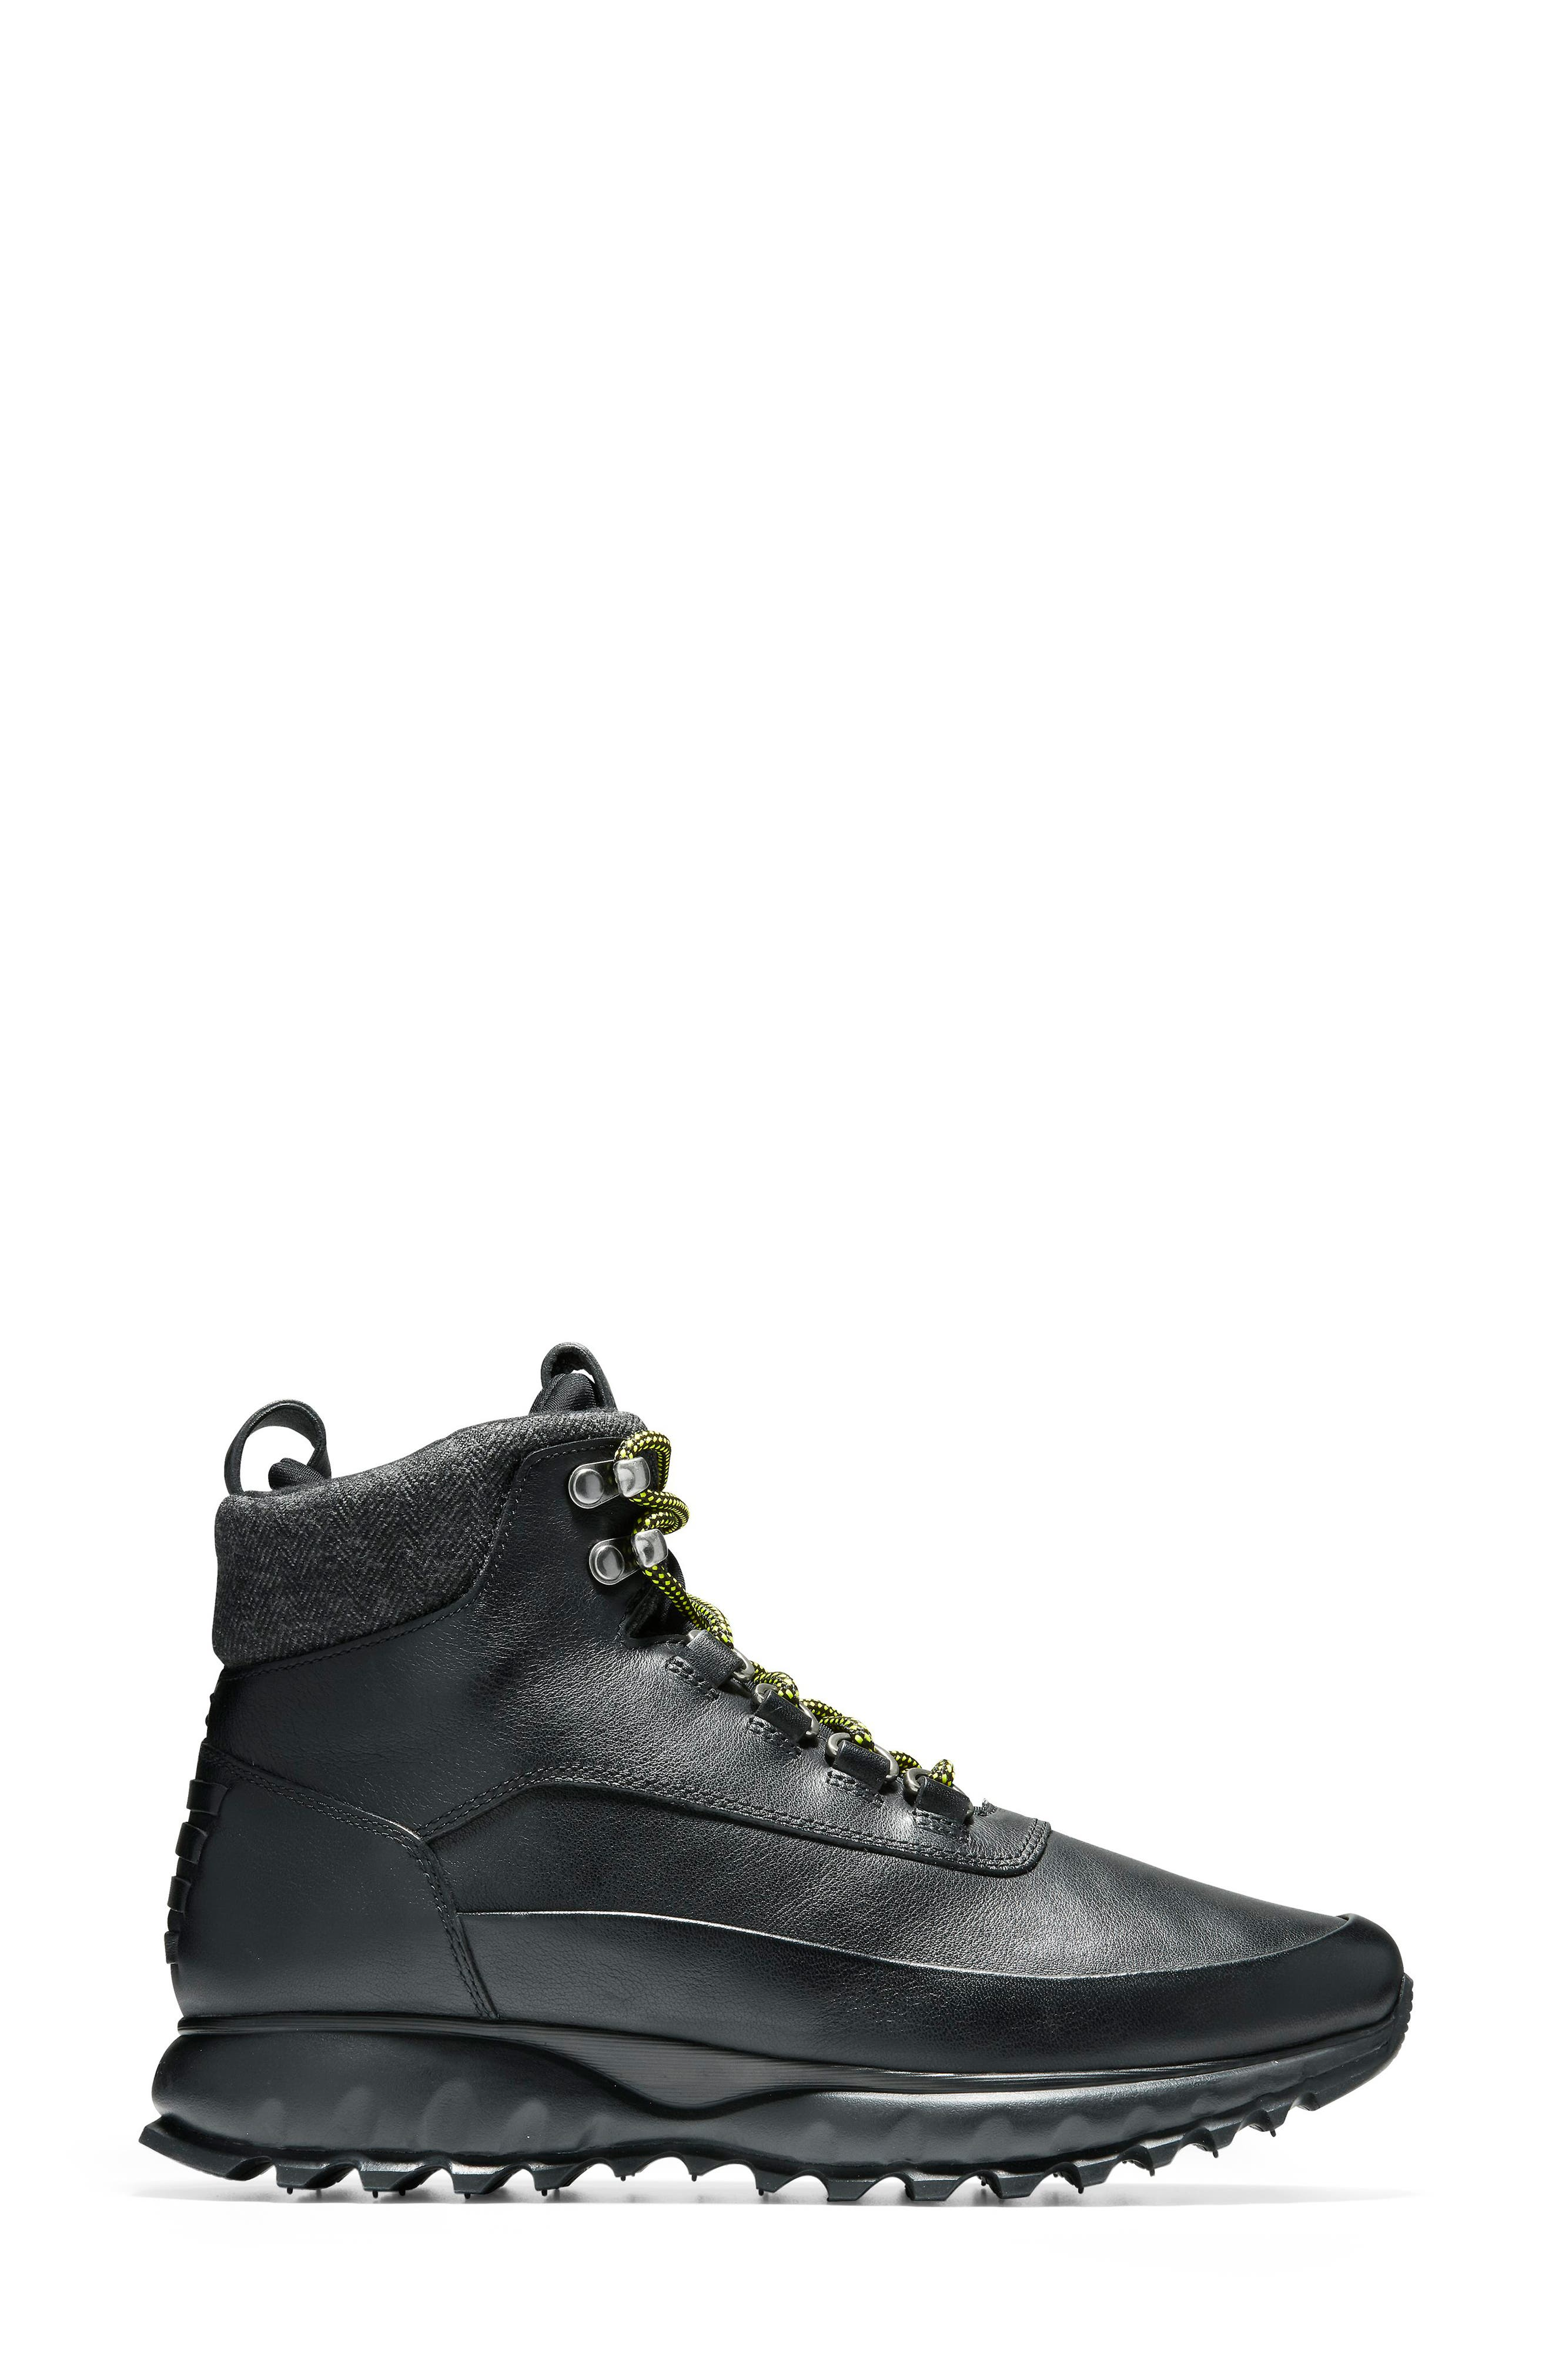 GrandExplore All Terrain Waterproof Hiking Boot,                             Alternate thumbnail 3, color,                             BLACK WATERPROOF LEATHER